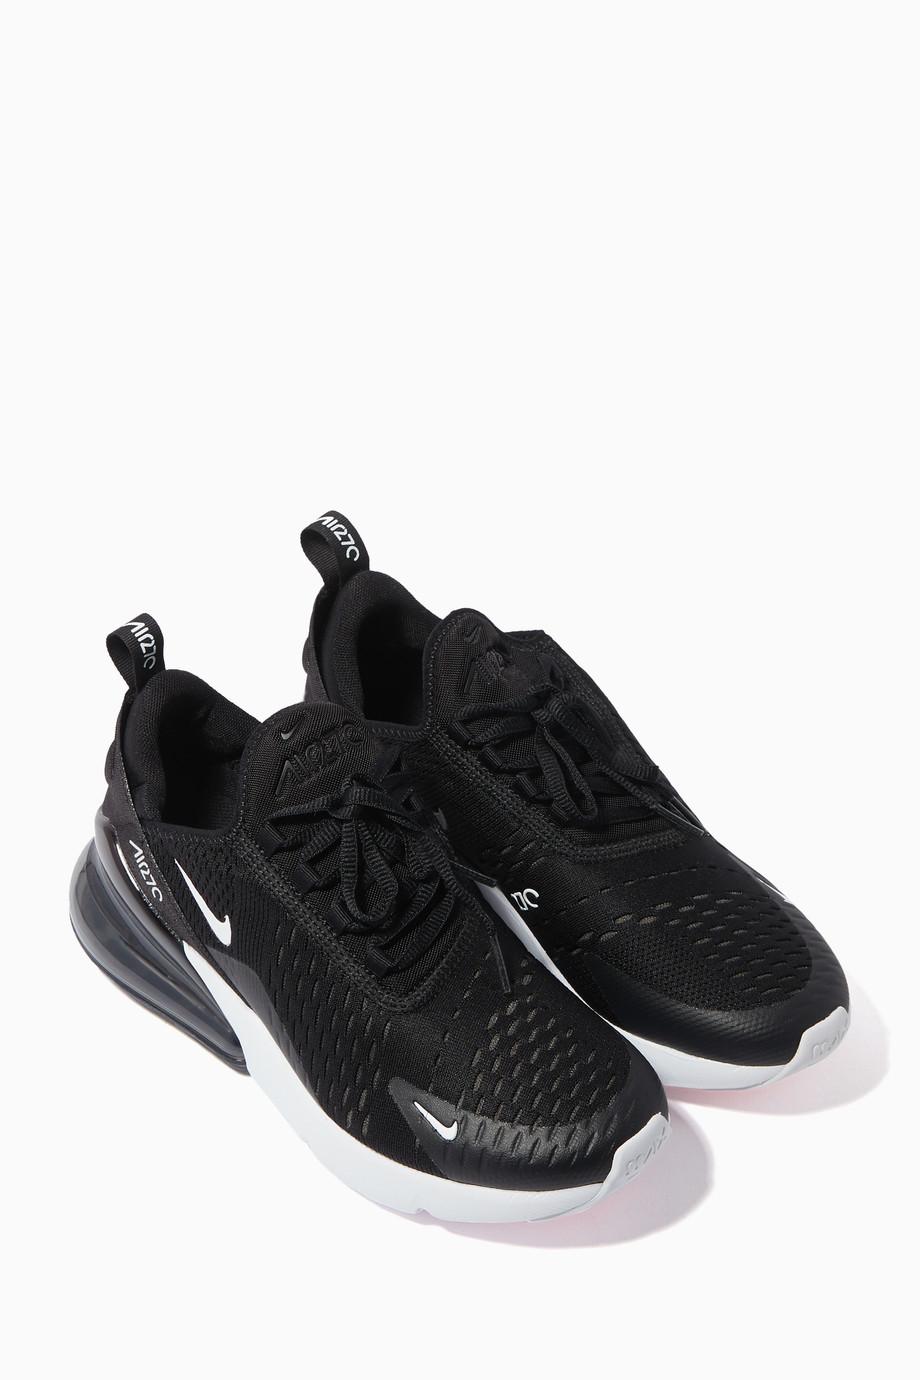 cheaper d5724 6d2ef Shop Nike Black Nike Air Max 270 for Kids   Ounass UAE